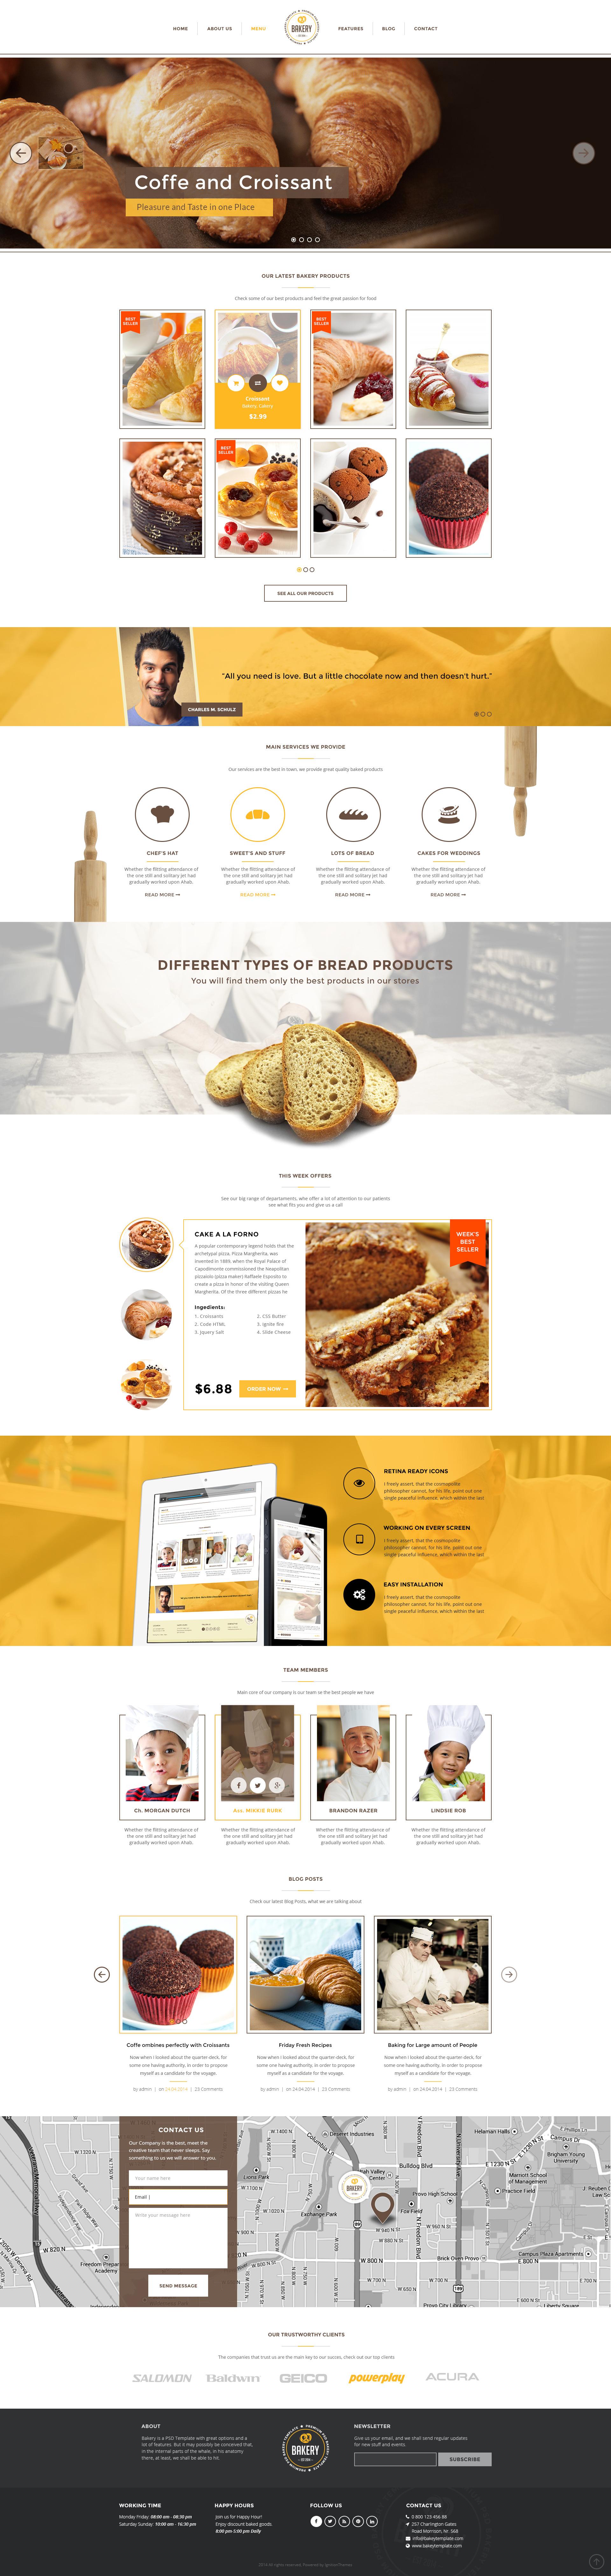 Bakery - Cakery & Bakery PSD Template by IgnitionThemes | ThemeForest